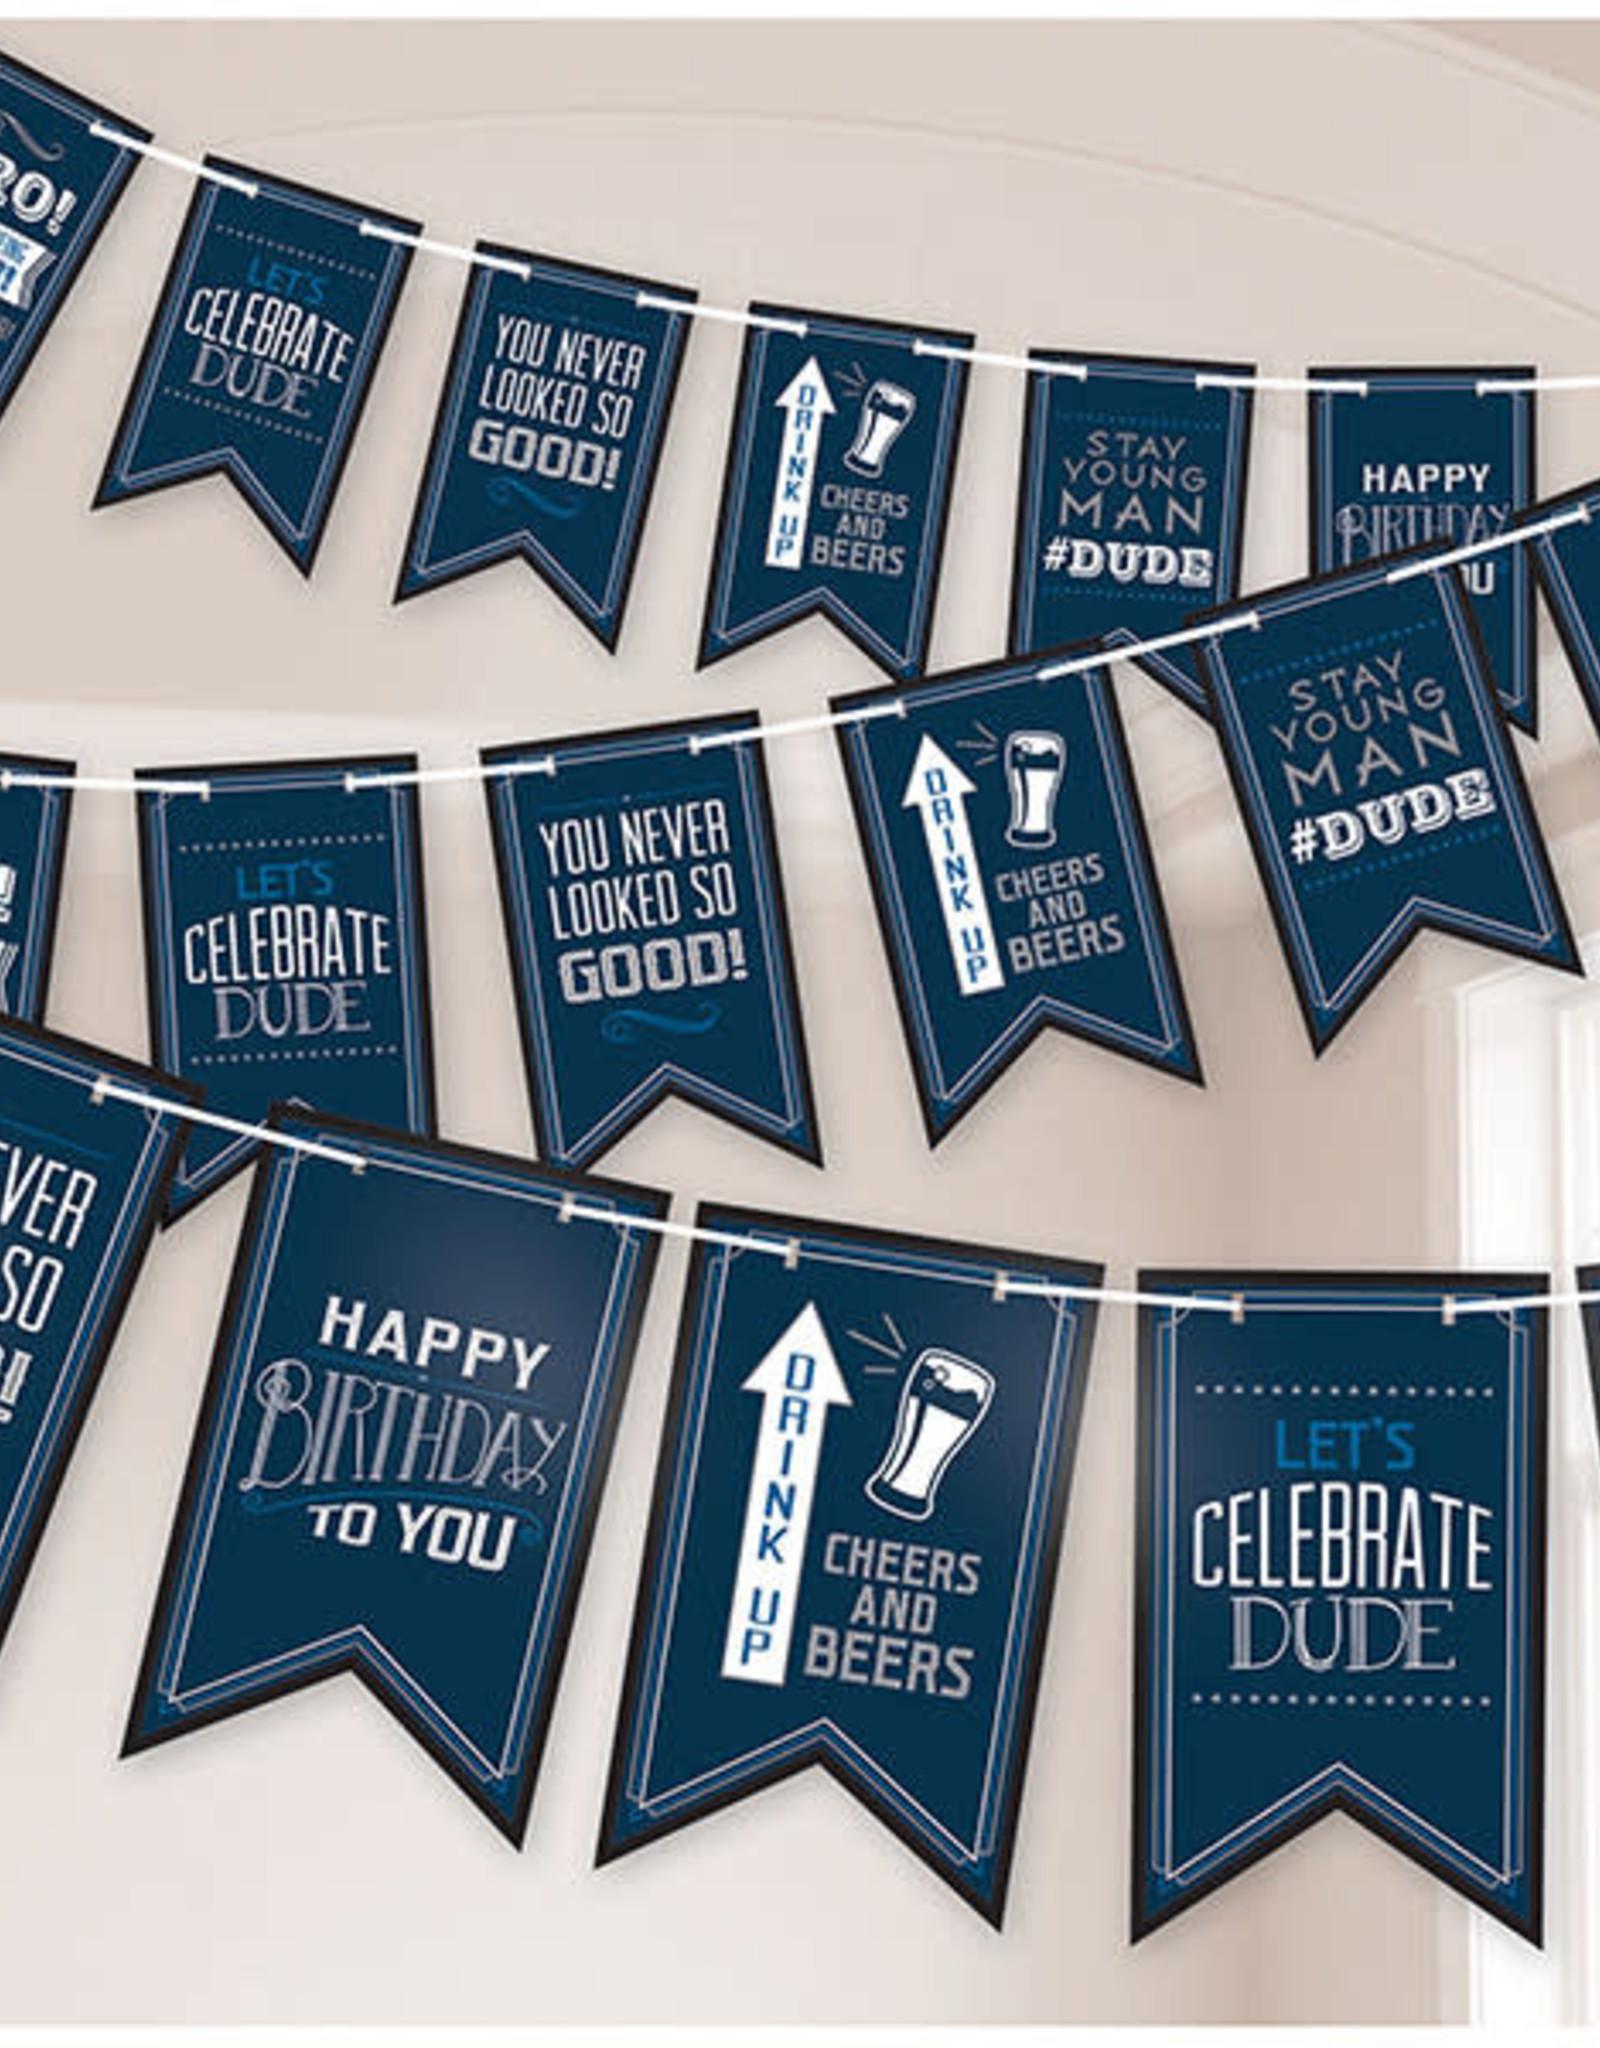 Happy Birthday Dude Pennant Banner 15FT